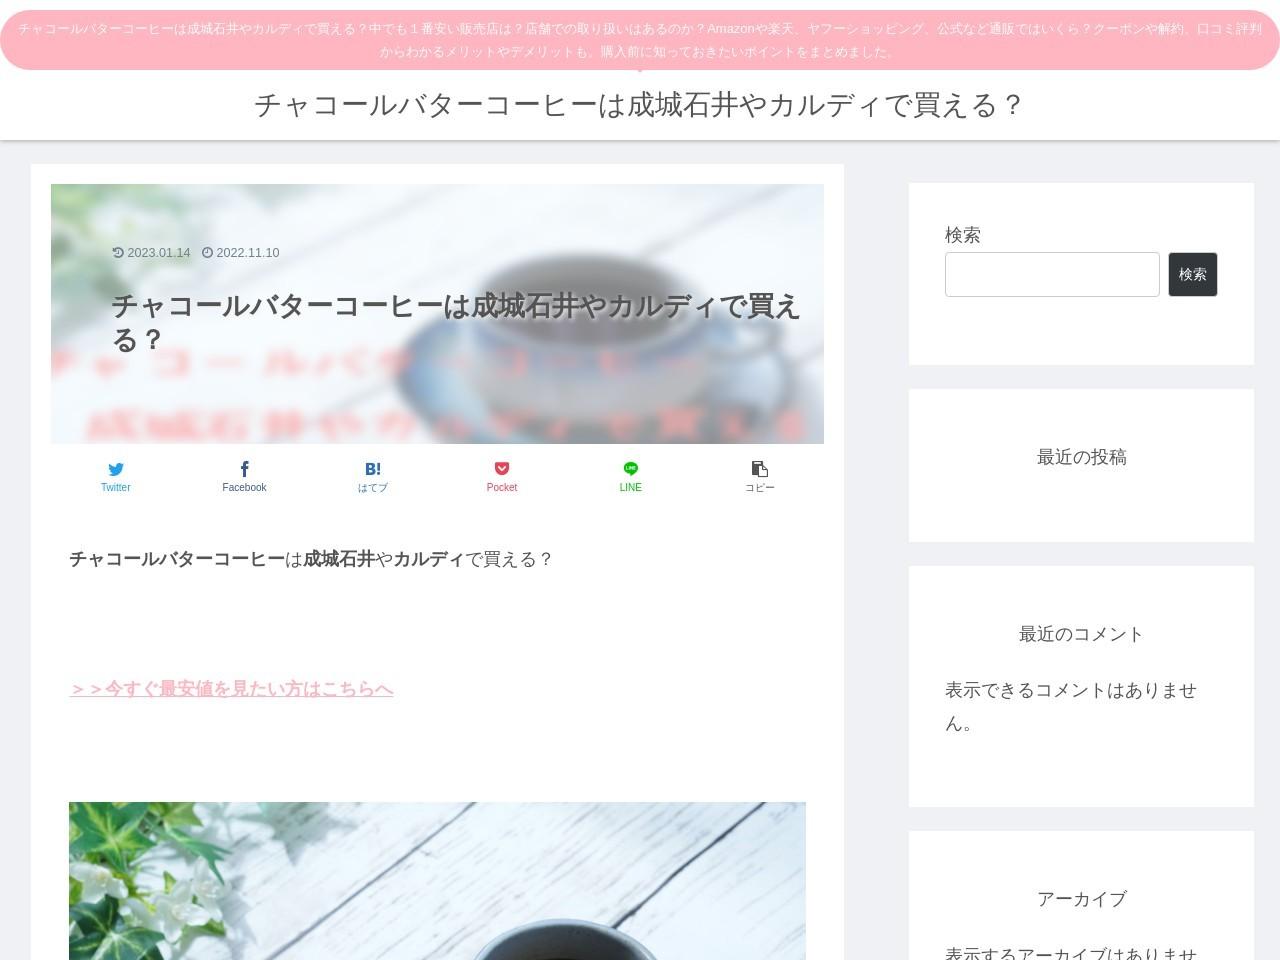 triangle-coffee.net -&nbspこのウェブサイトは販売用です! -&nbsp自家焙煎珈琲店 東京都東大和市 最高級珈琲 西武線沿線 珈琲 焙煎 自家 リソースおよび情報